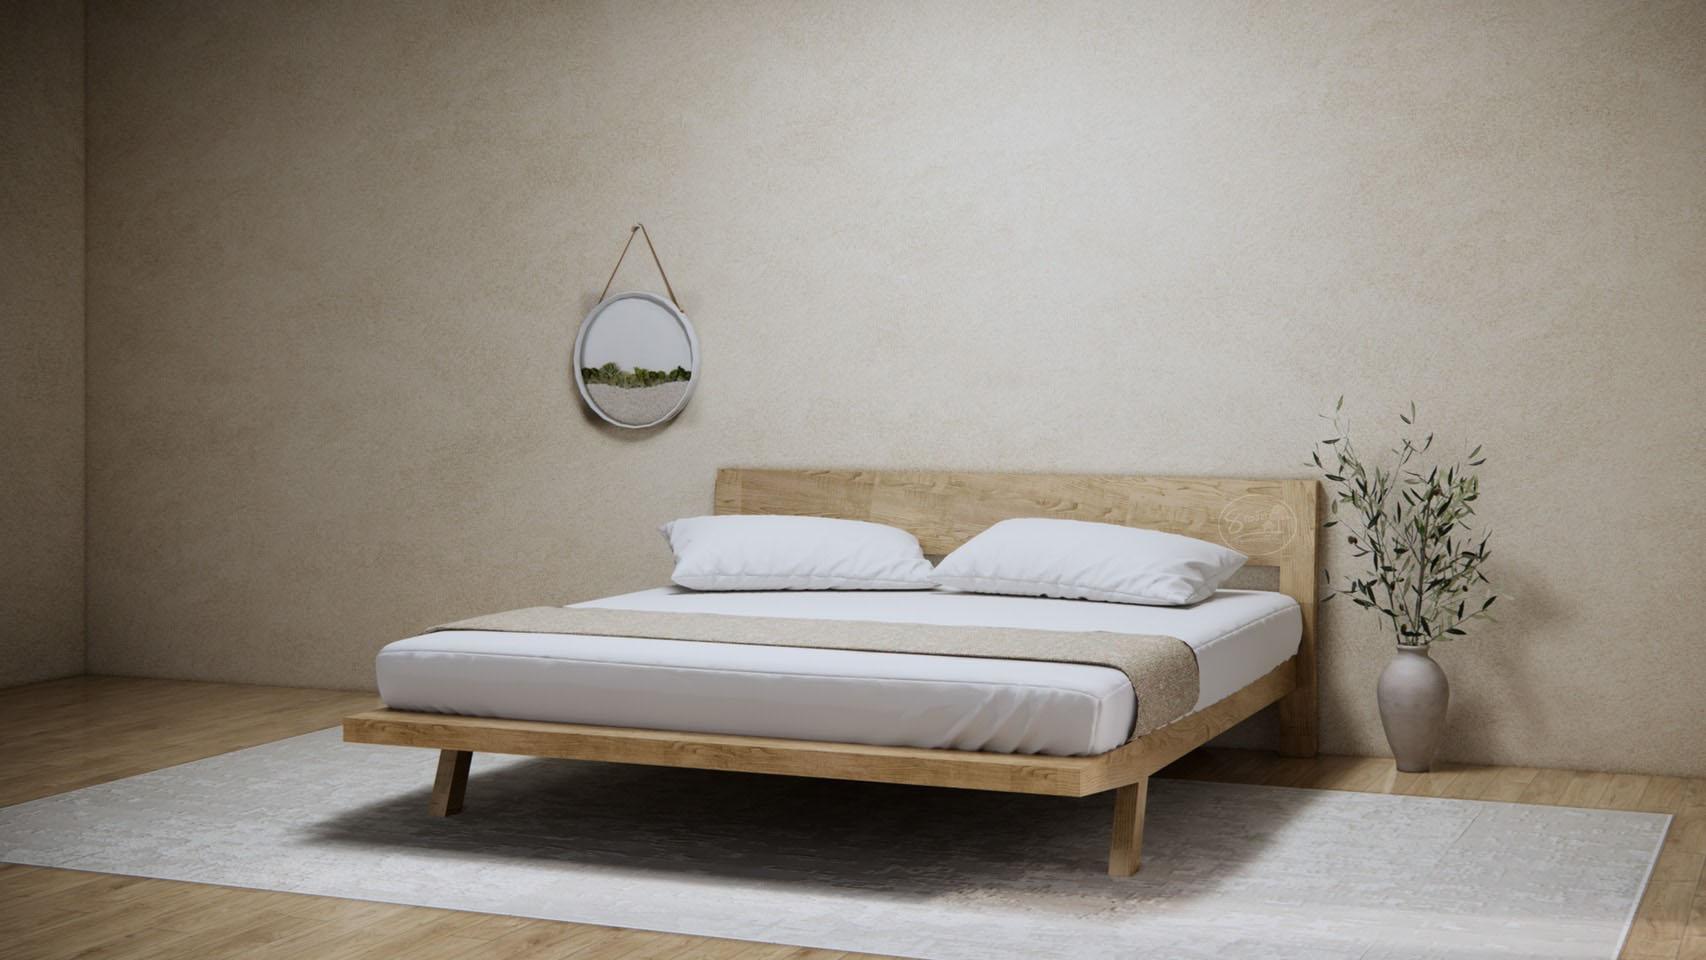 KR108 Slove Bed ⚡ เตียงนอนแบบขาเฉียง ⚡